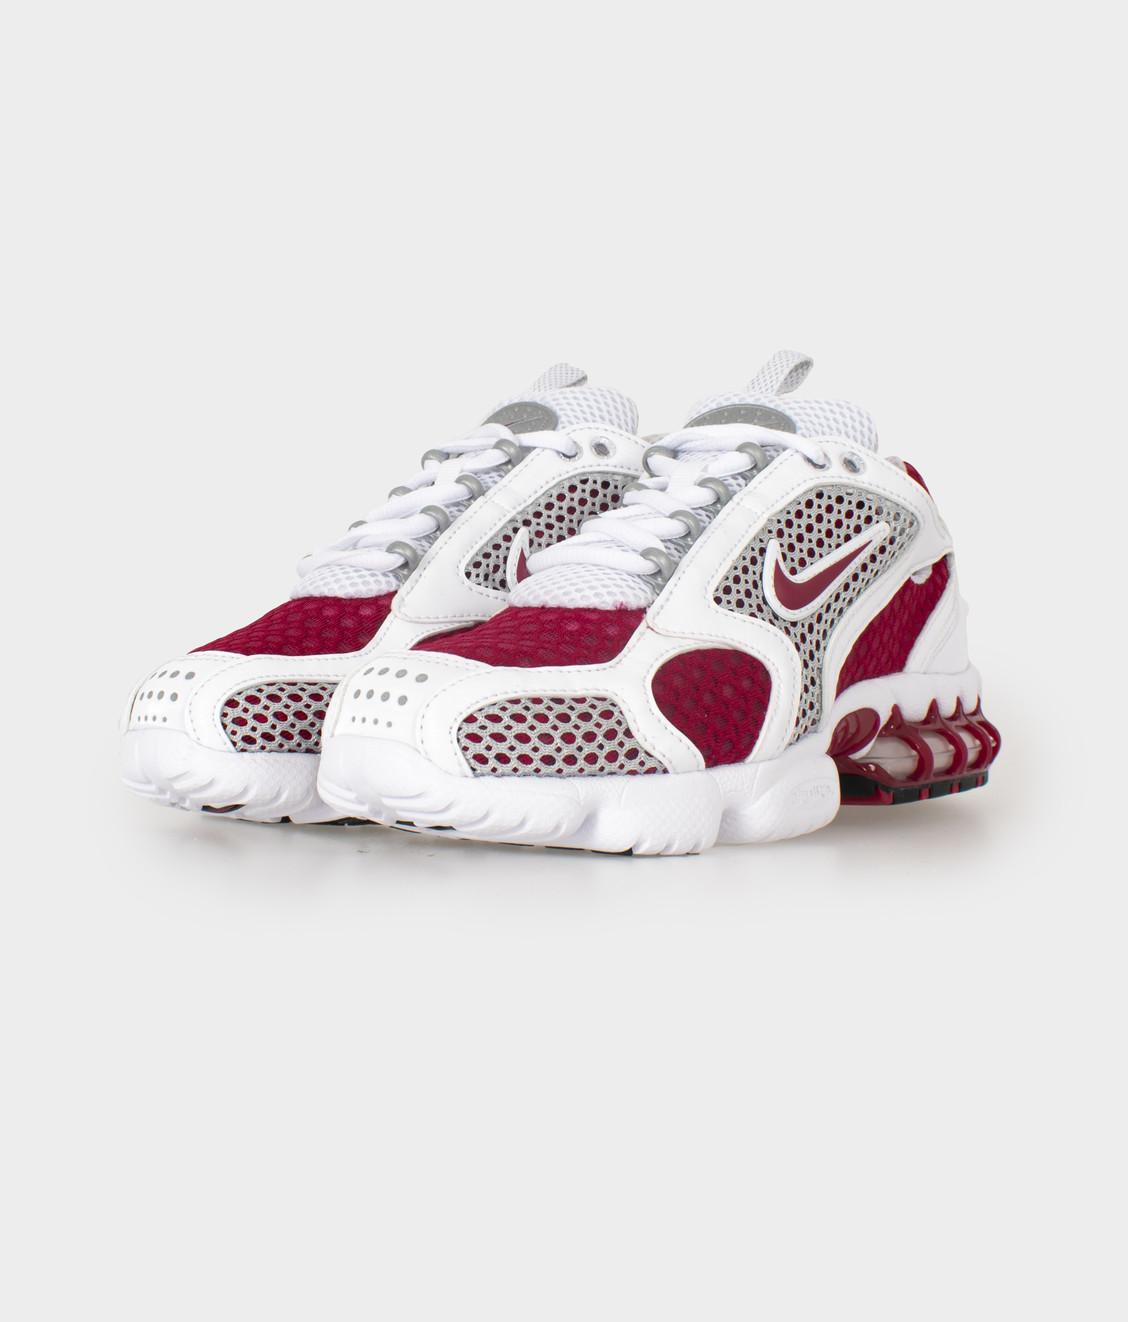 Nike Nike Air Zoom Spiridon Cage 2 Cardinal Red W